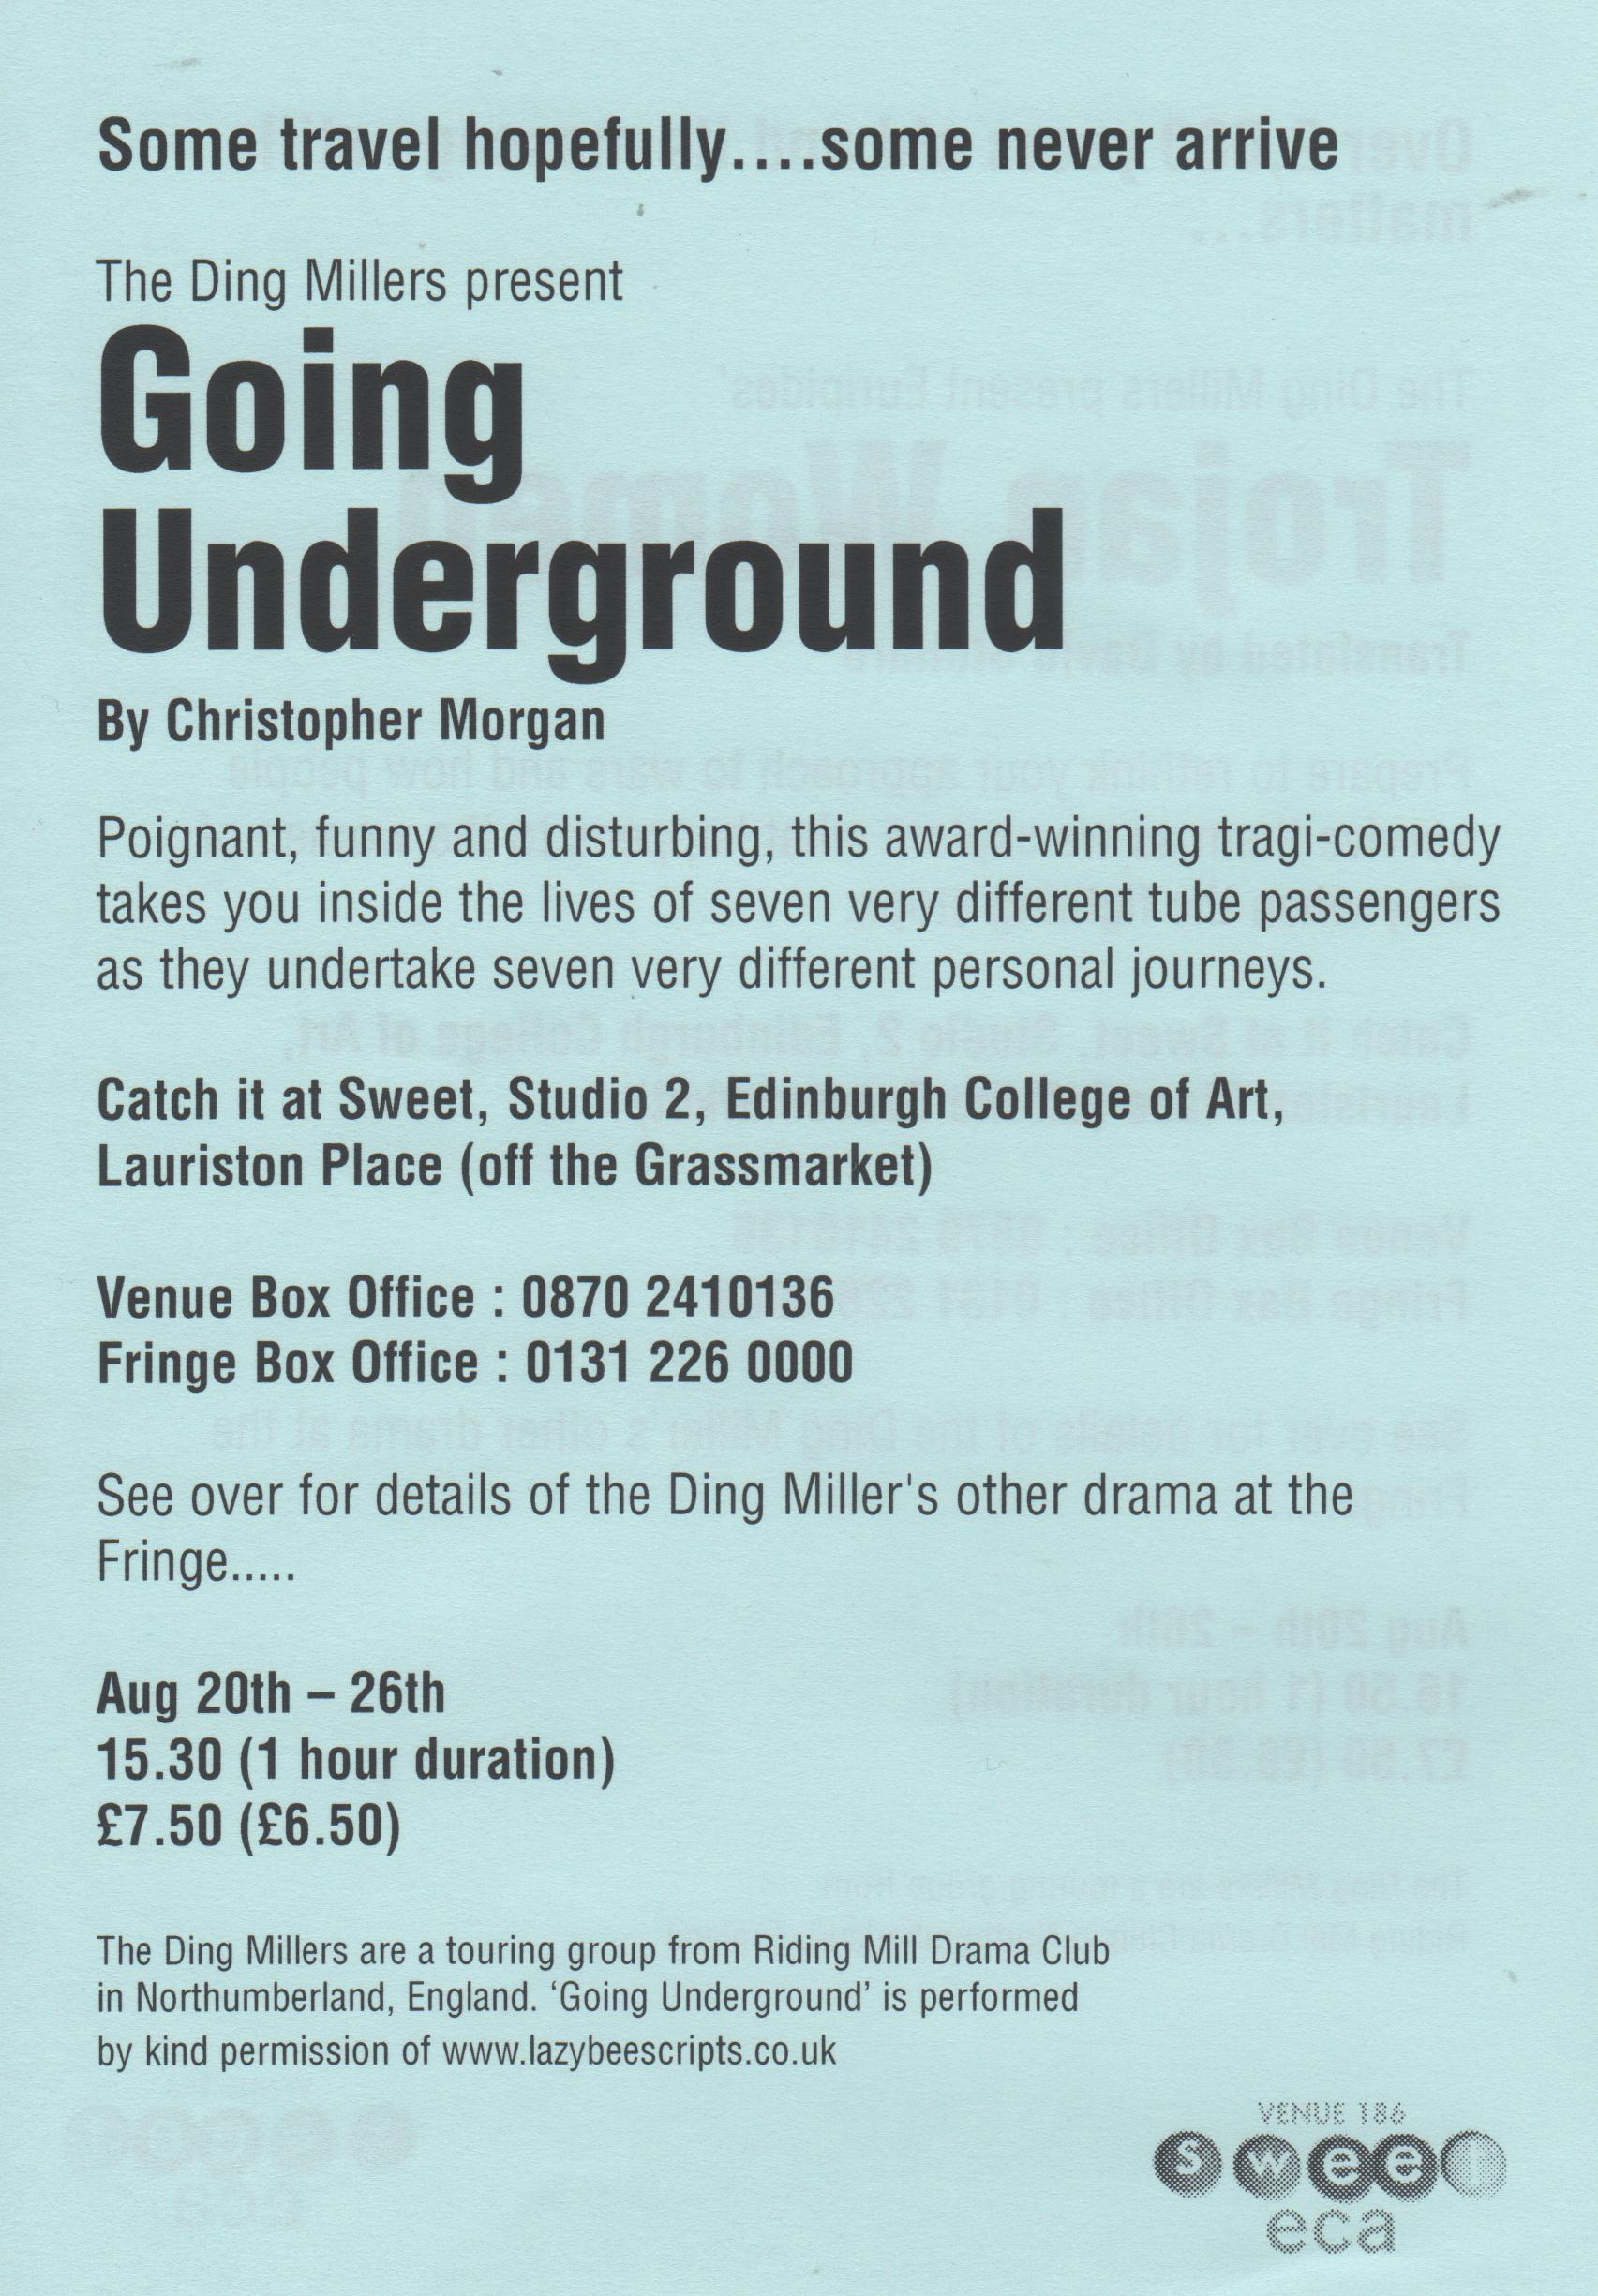 2007, The Ding Millers in Edinburgh, Goi